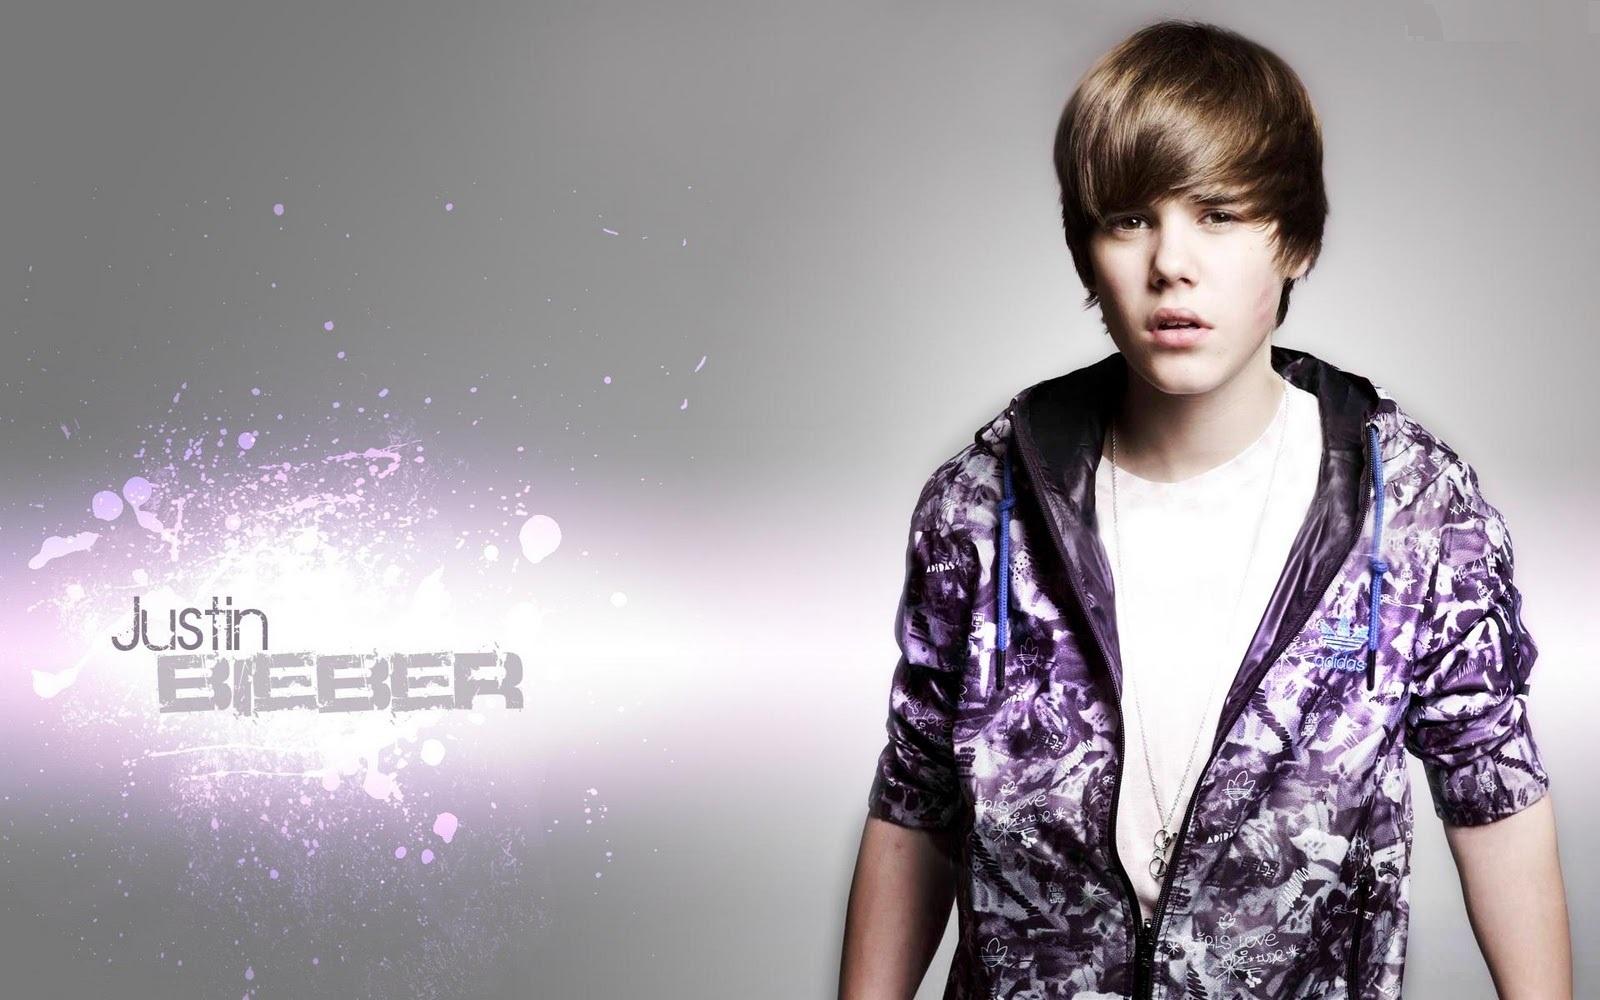 Hd wallpaper justin bieber - Http 3 Bp Blogspot Com Vk8t Vfef4u All About Hd Wallpapers Justin Bieber